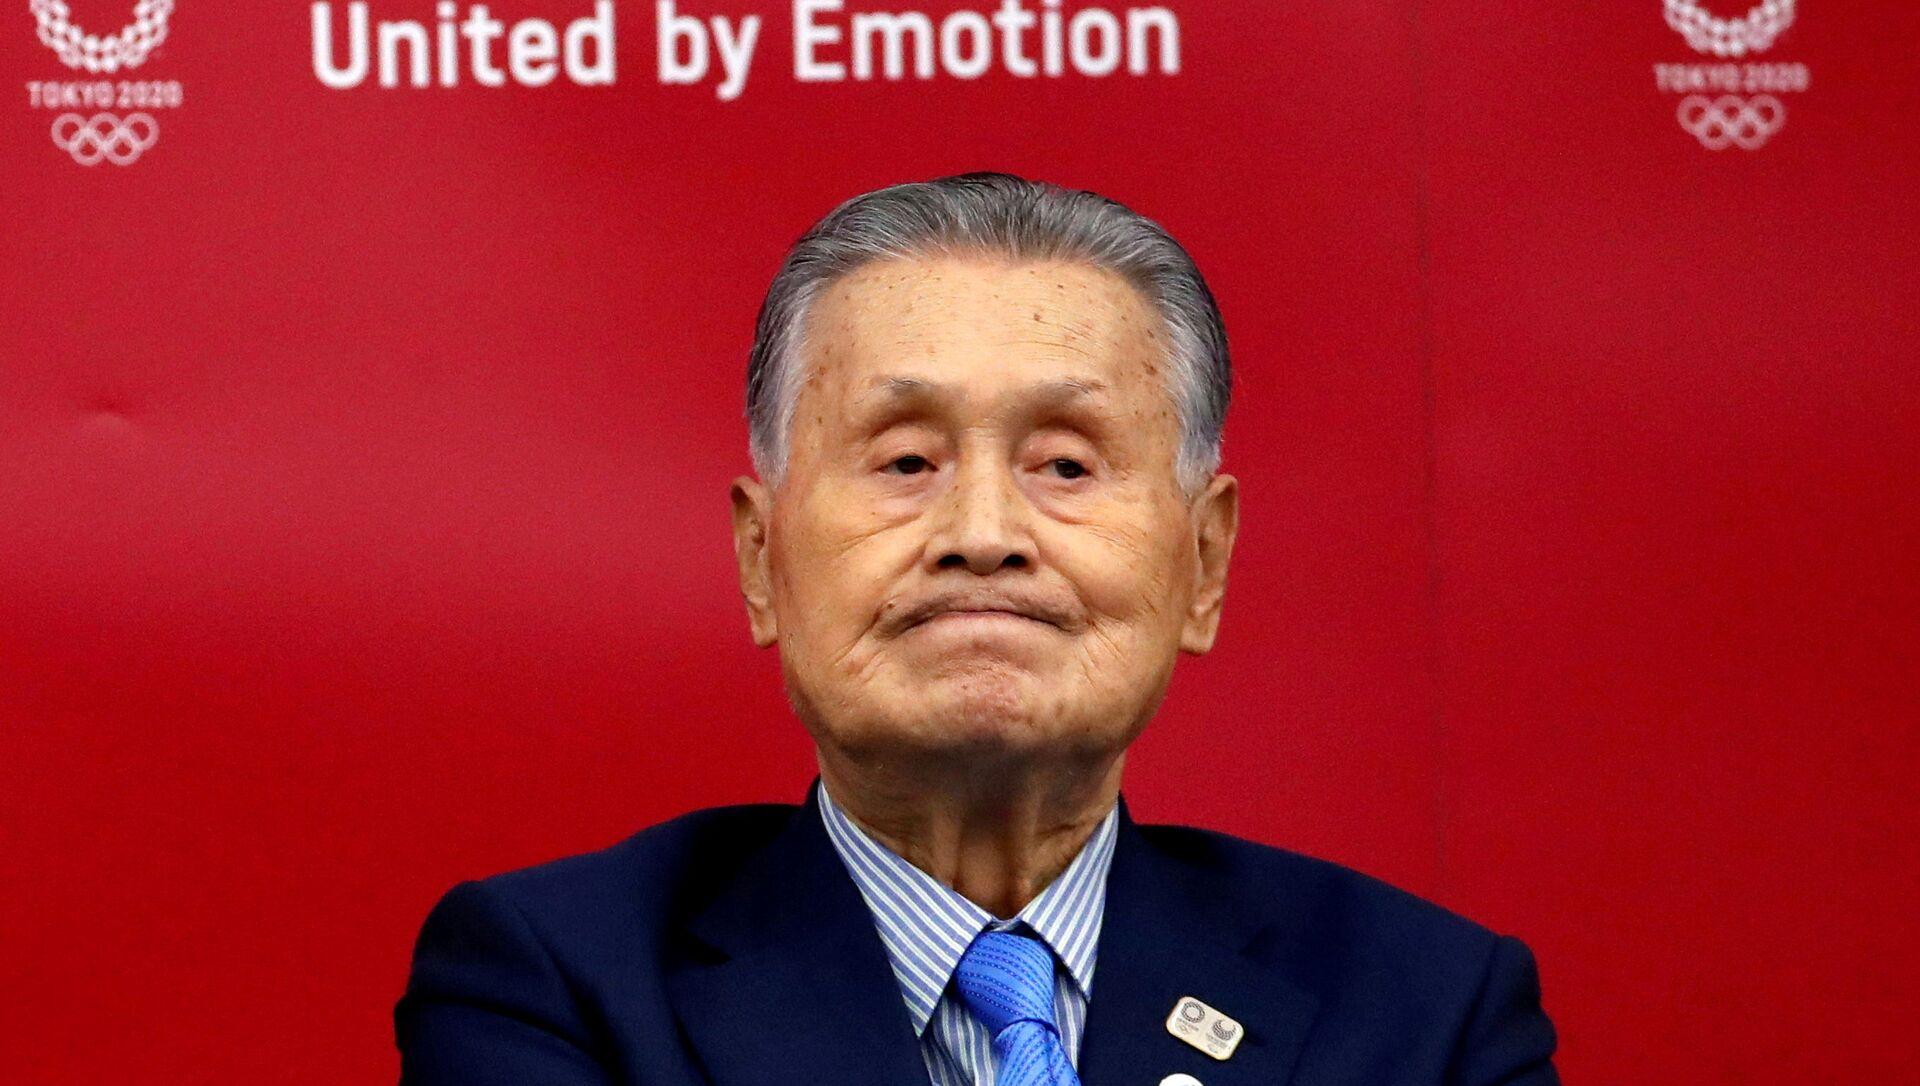 Yoshiro Mori, President del Comitato Olimpico giapponese responsabile per Tokyo 2020  - Sputnik Italia, 1920, 11.02.2021